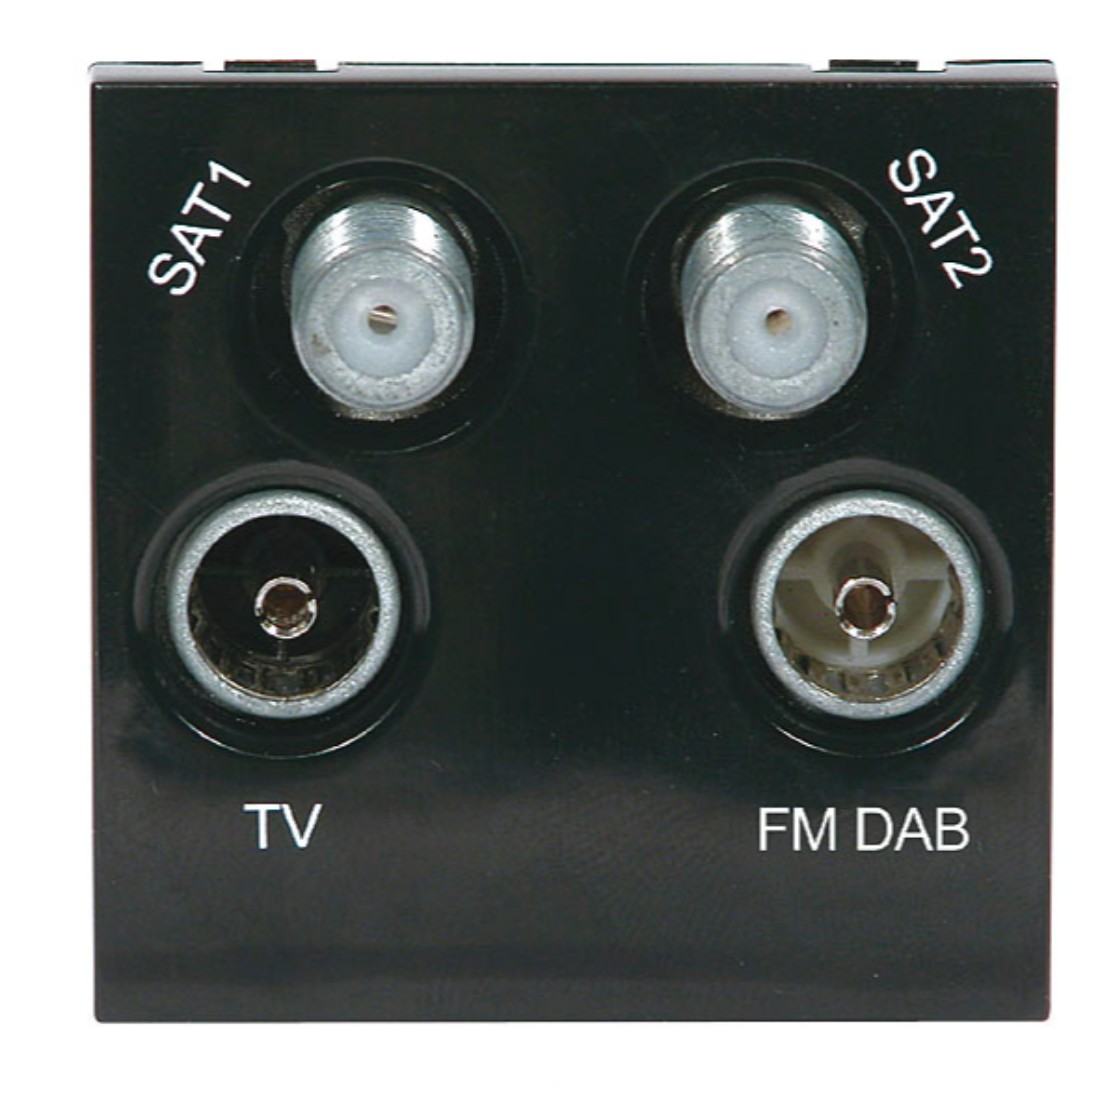 screened quadplexed outlet module 50 x 50mm black labgear rh labgear co uk 2007 Heritage Classic Wiring Diagram Badlands Wiring -Diagram